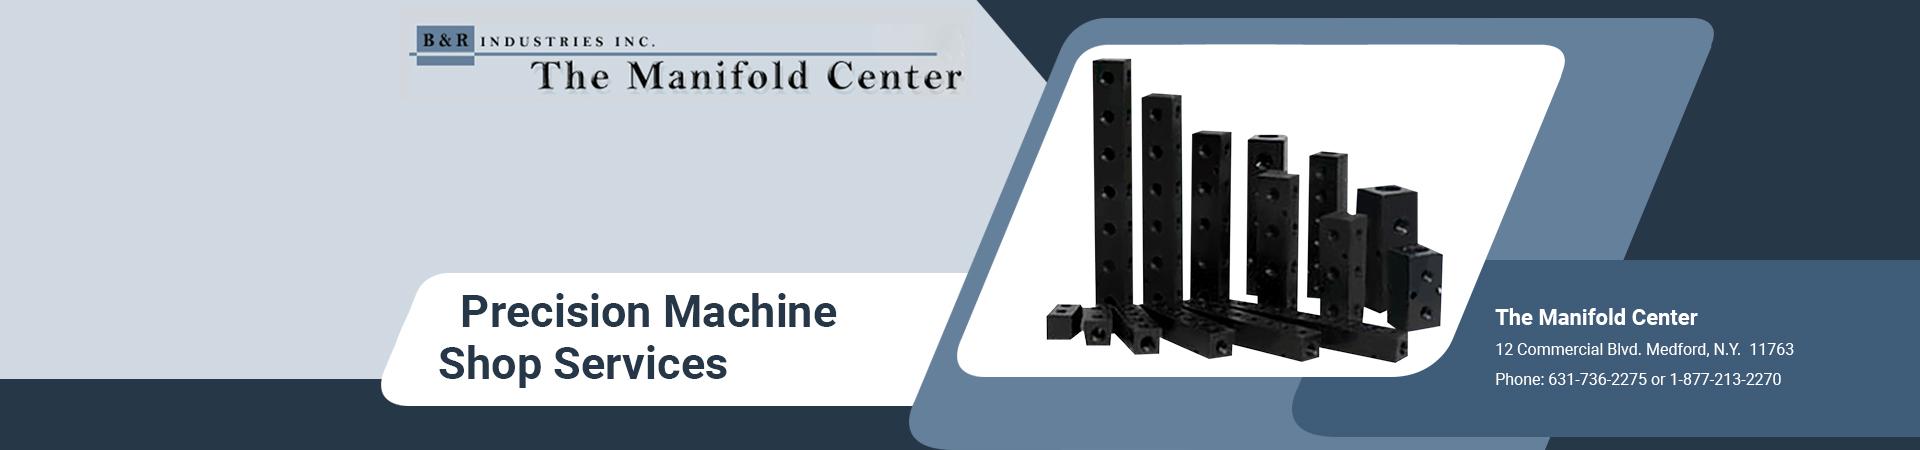 Precision-Machine-Shop-Services The Manifold Center